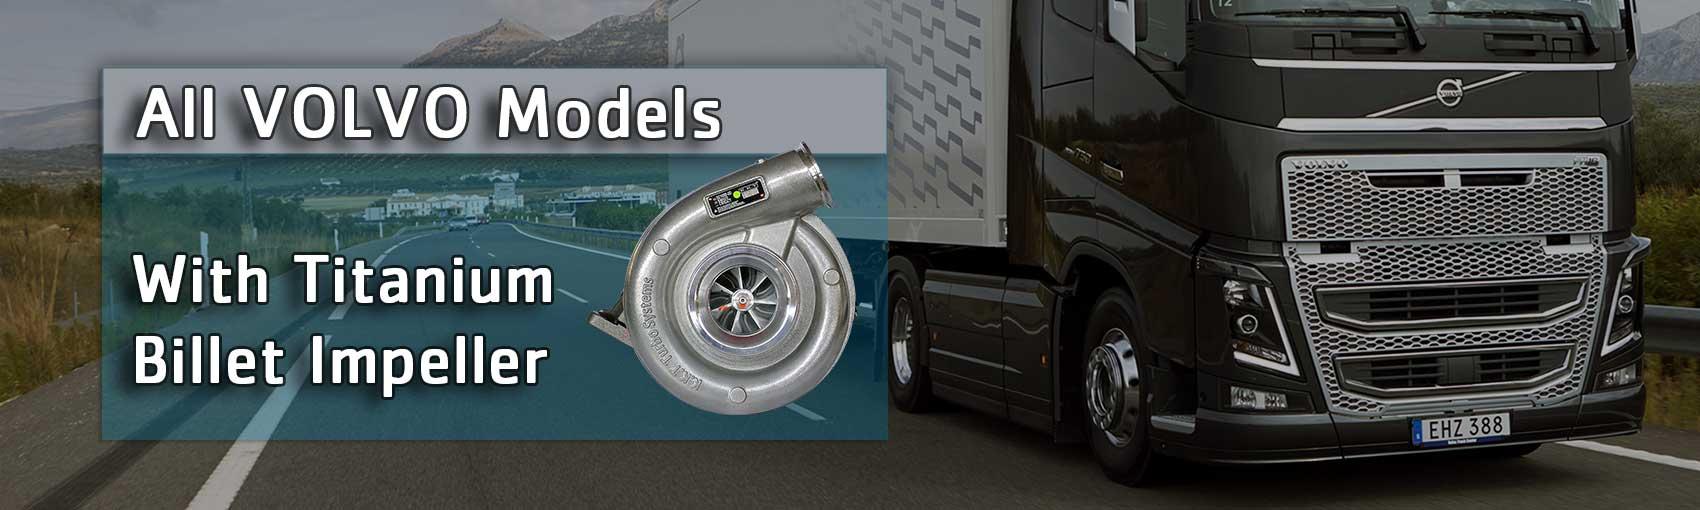 volvo_series_kkt_turbochargers